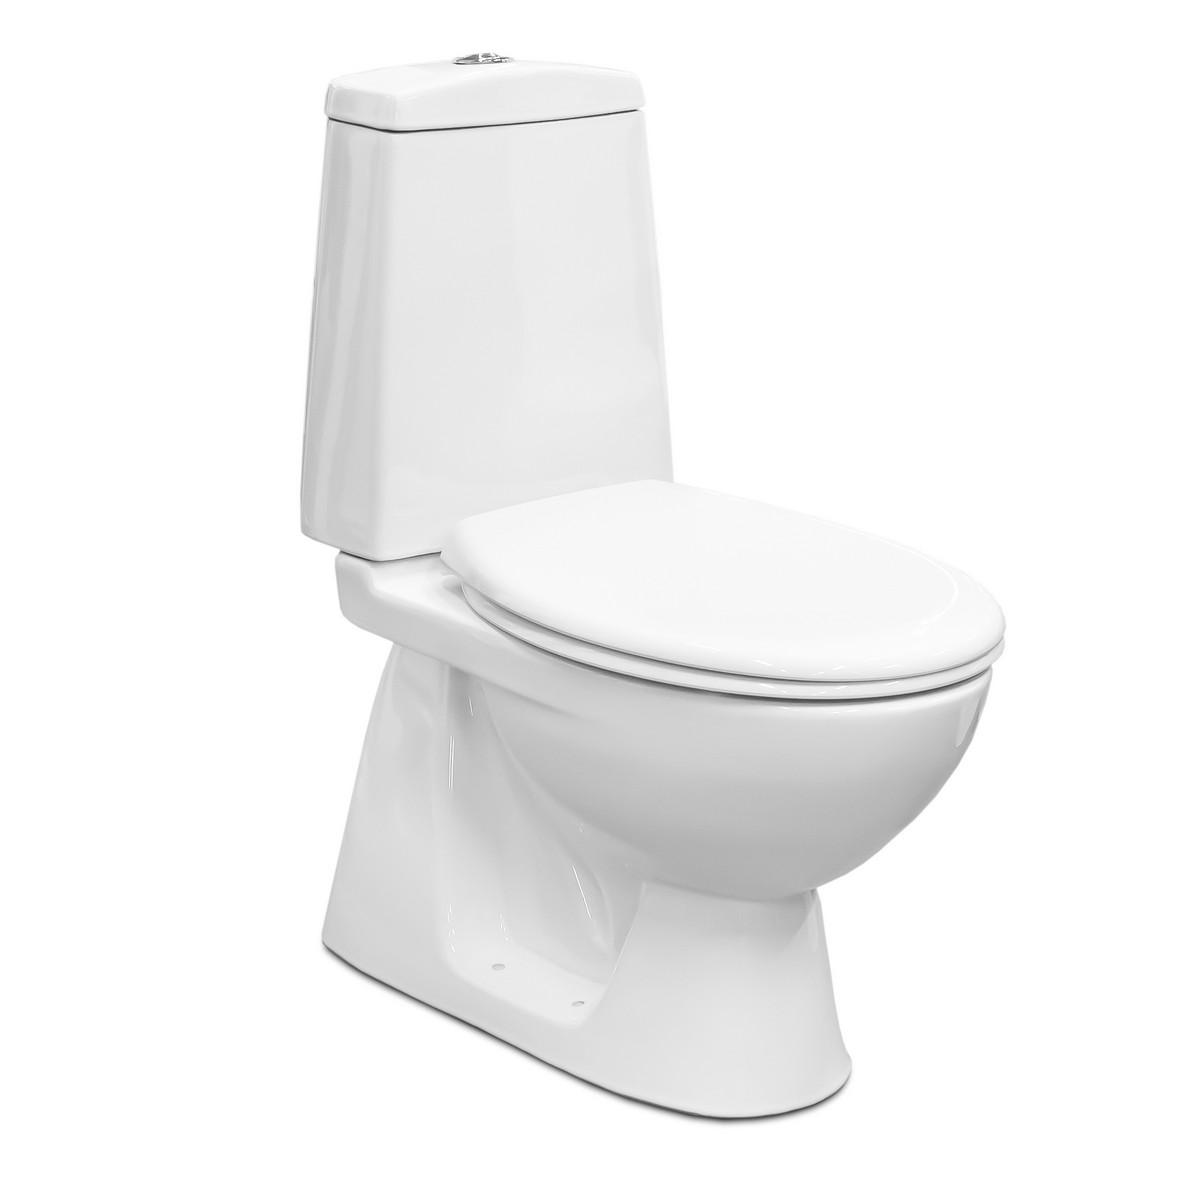 Toalett, sits & toalettsitsar - Badrum - Stuvbutiken : mått toalett : Inredning